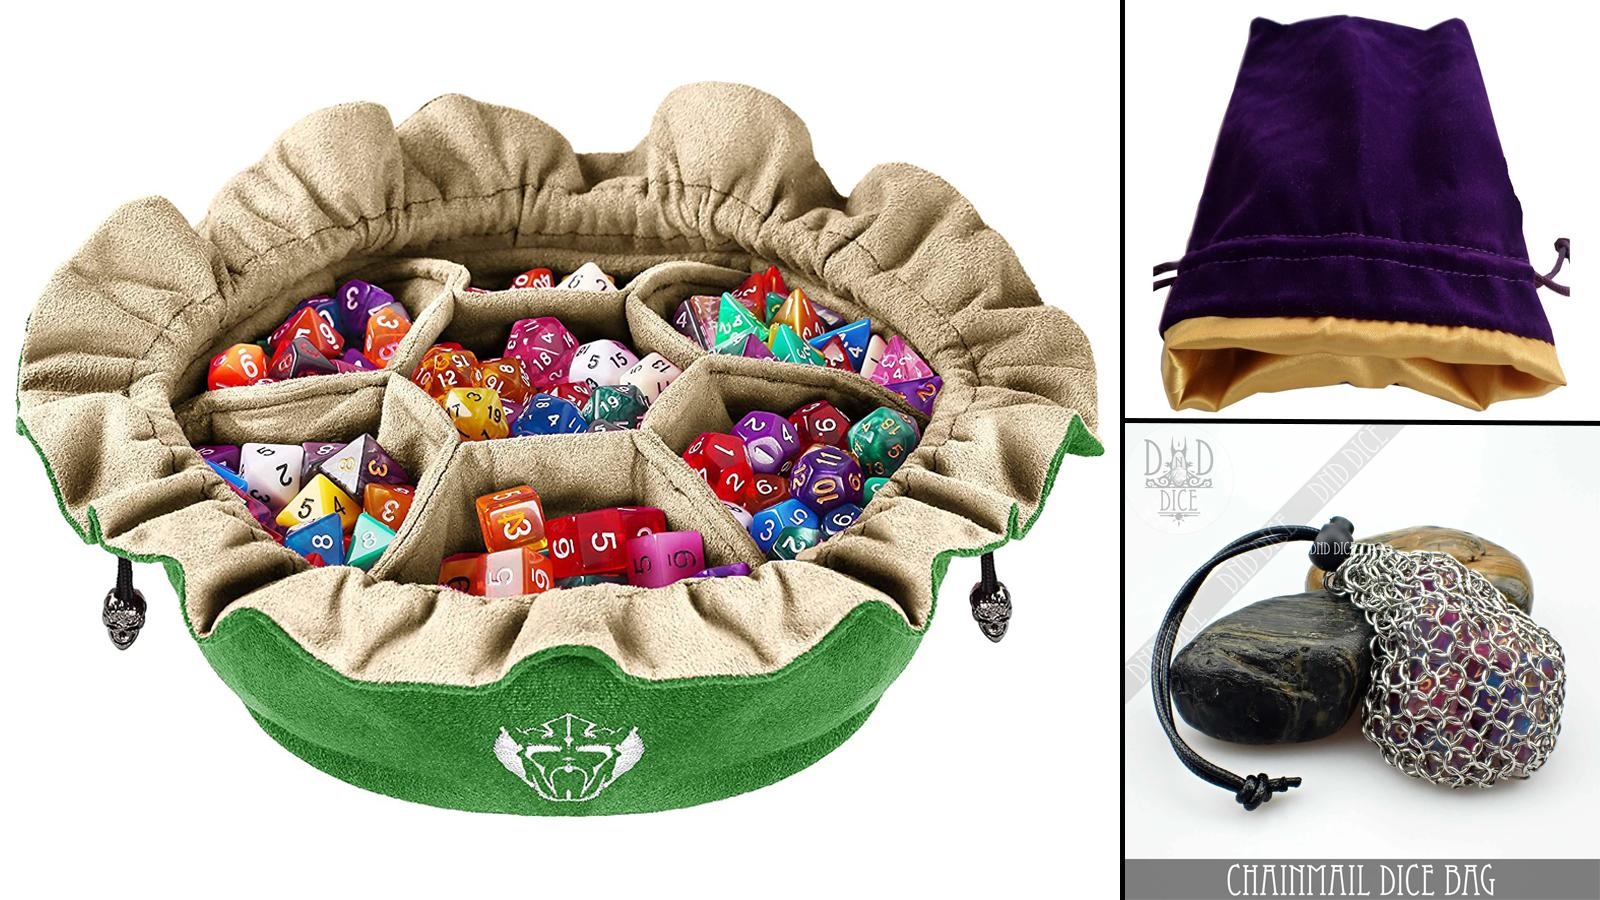 Various dice bag styles